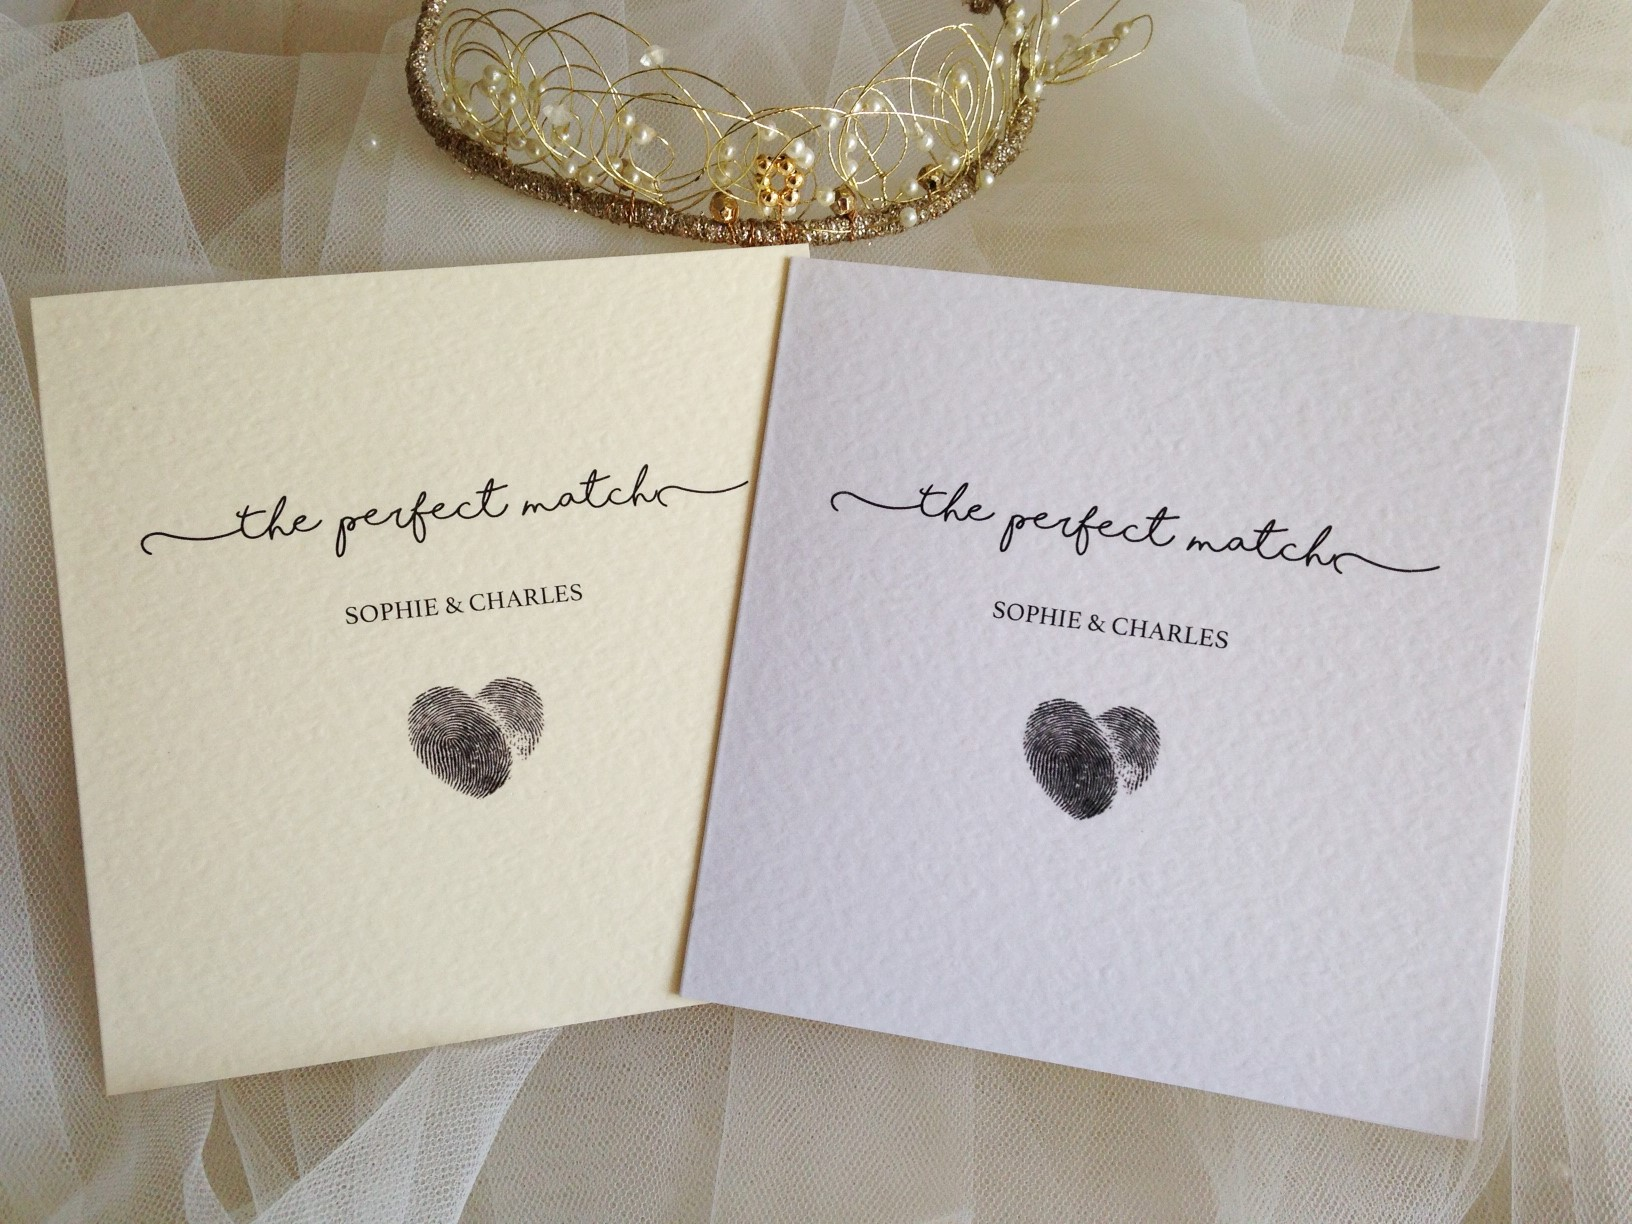 Perfect Wedding Invitations: Perfect Match Wedding Invitations £1.25